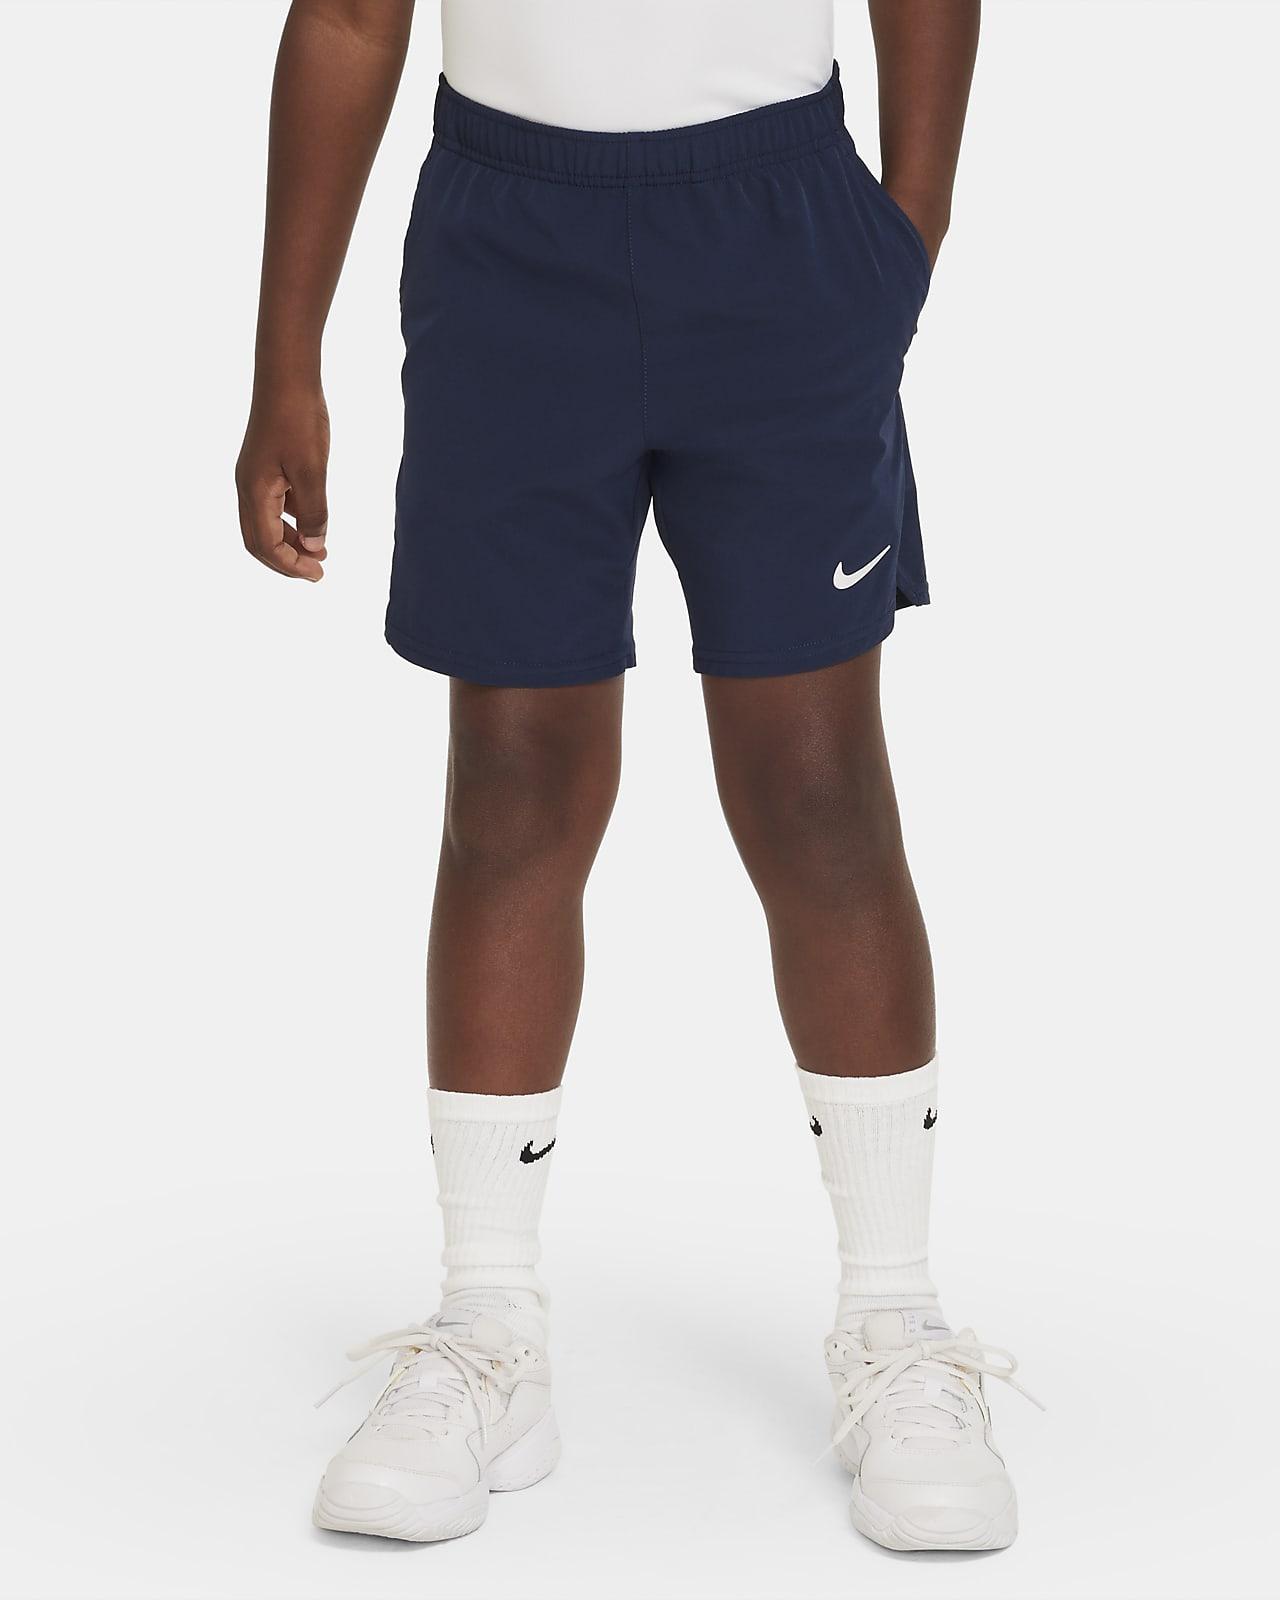 Shorts da tennis NikeCourt Flex Ace - Ragazzo